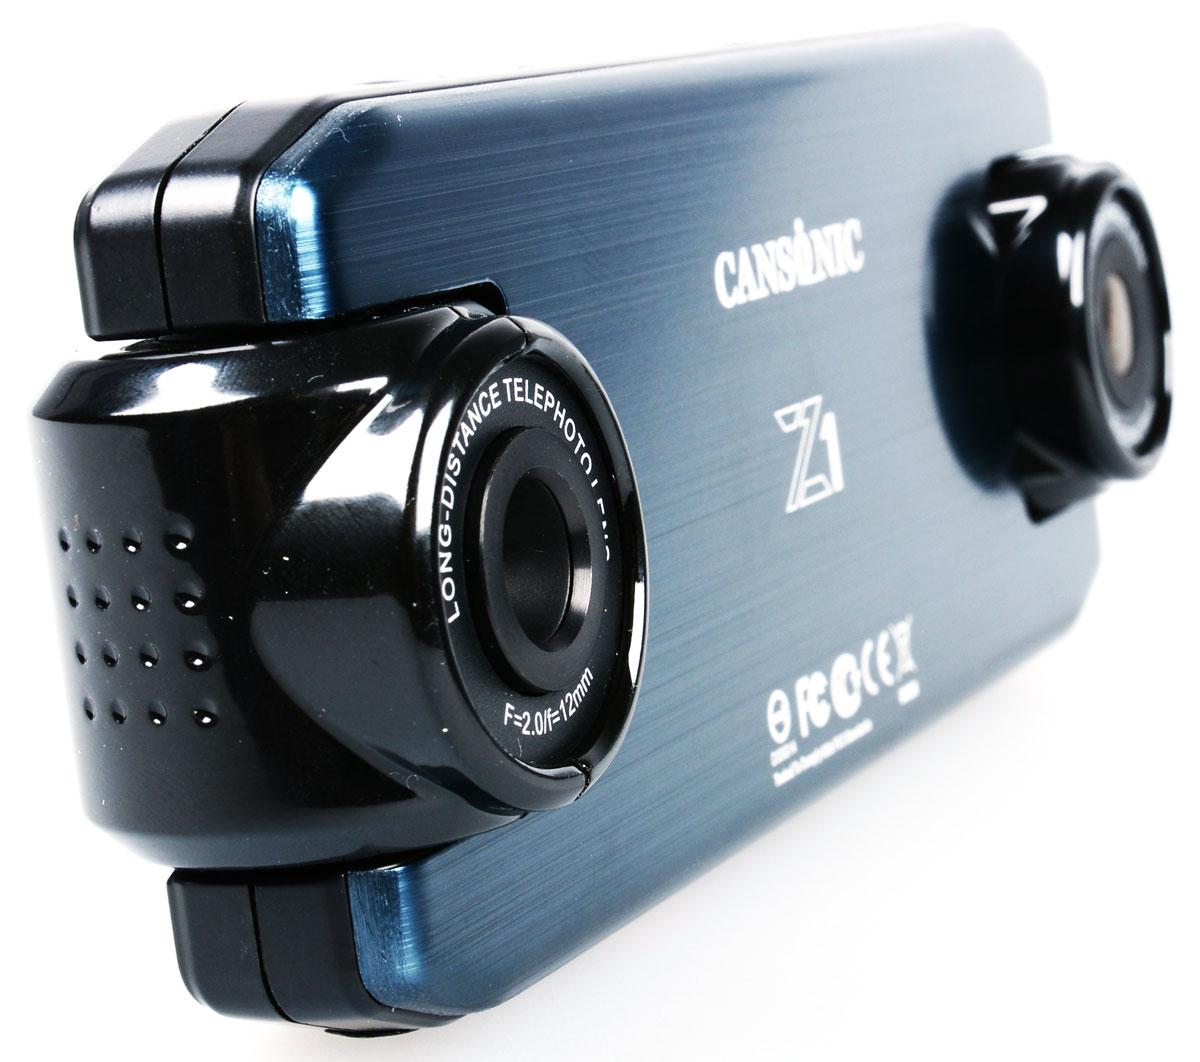 Cansonic Z1 Zoom GPS, Black видеорегистратор cansonic z1 dual black видеорегистратор